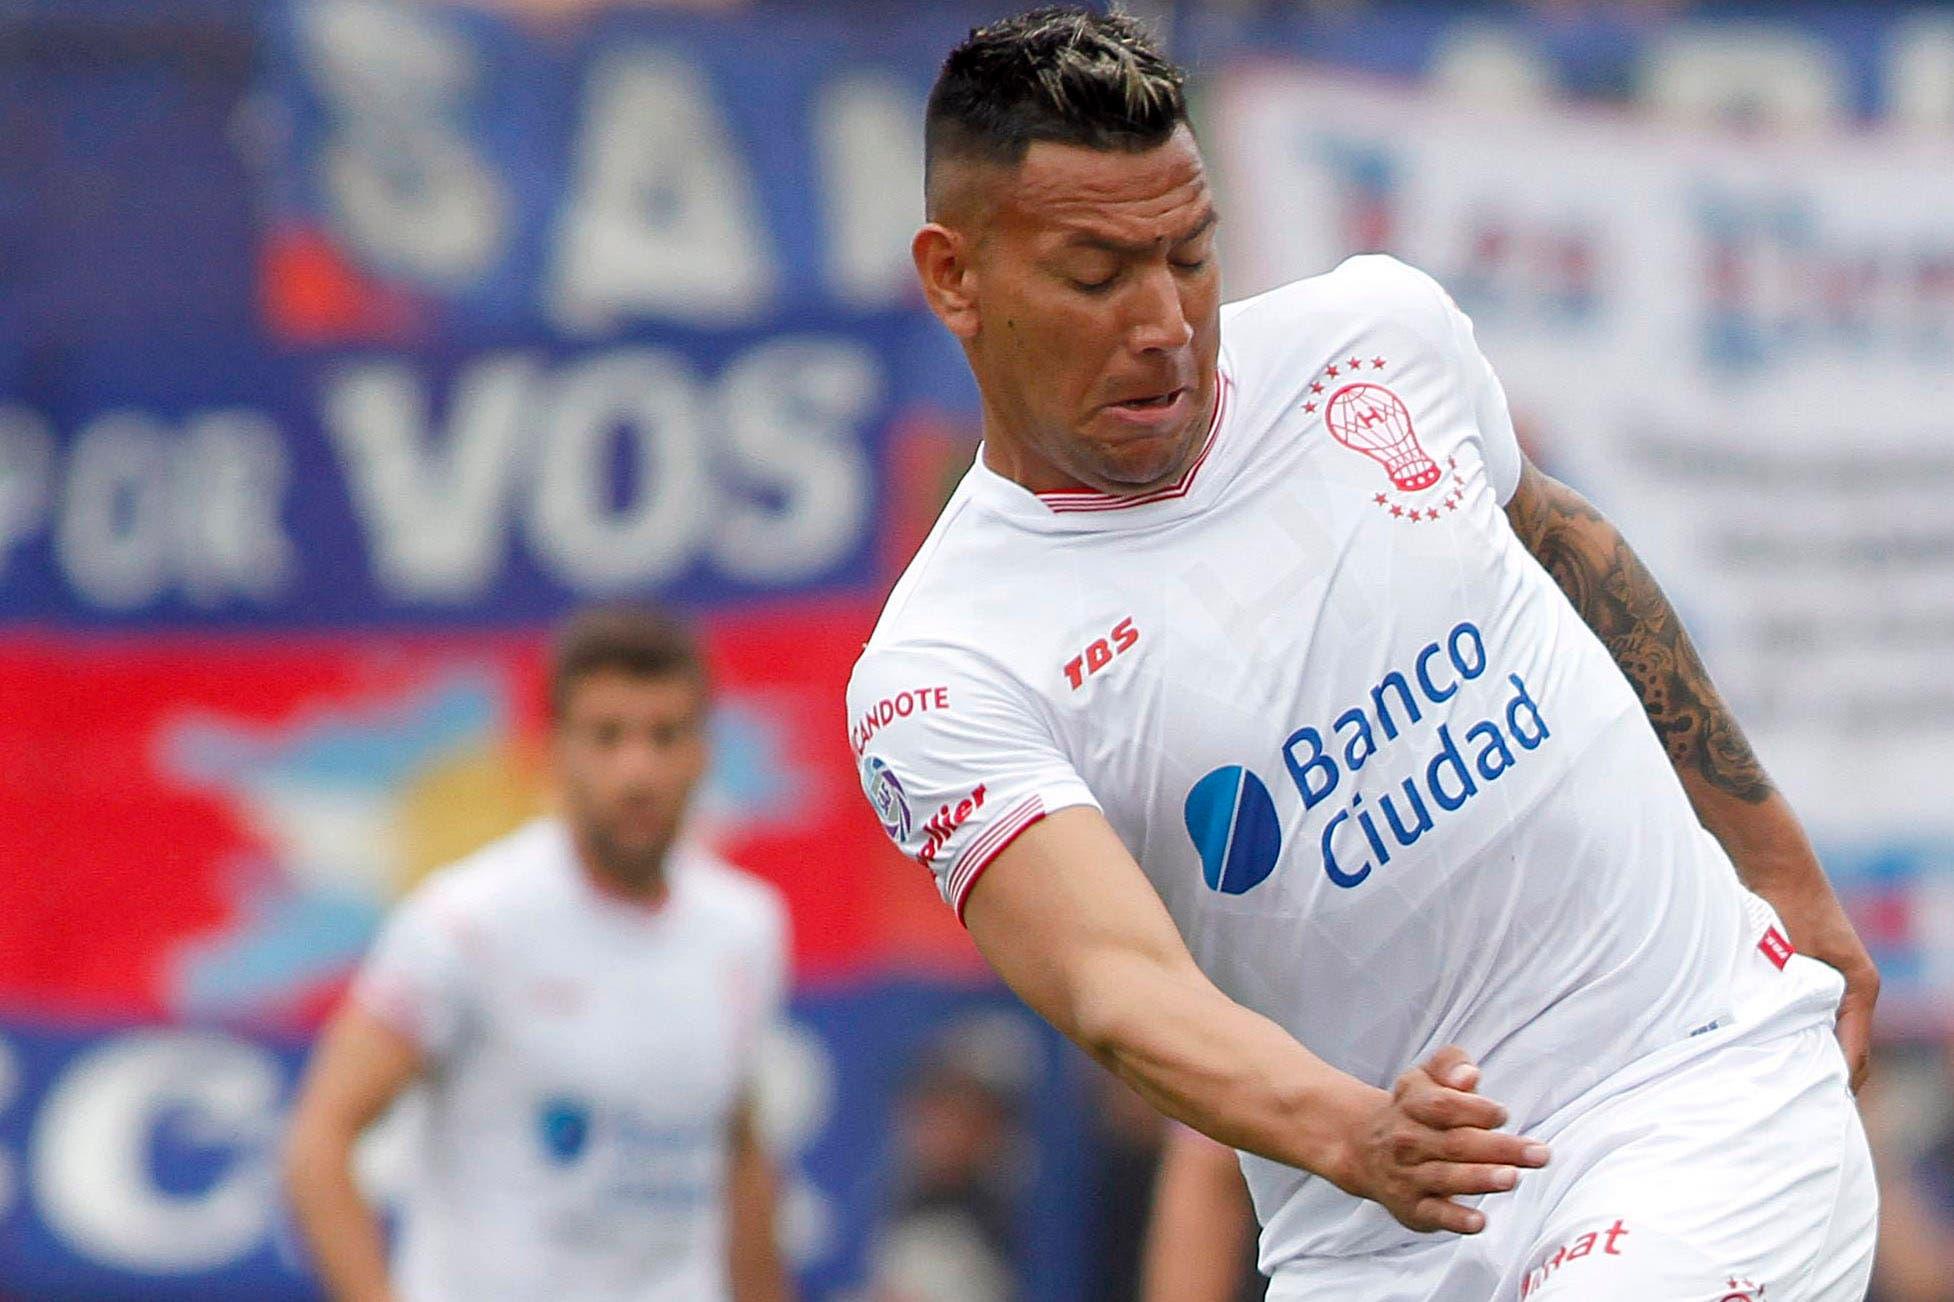 Belgrano-Huracán, Superliga: el Globo pretende extender la racha ganadora en Córdoba